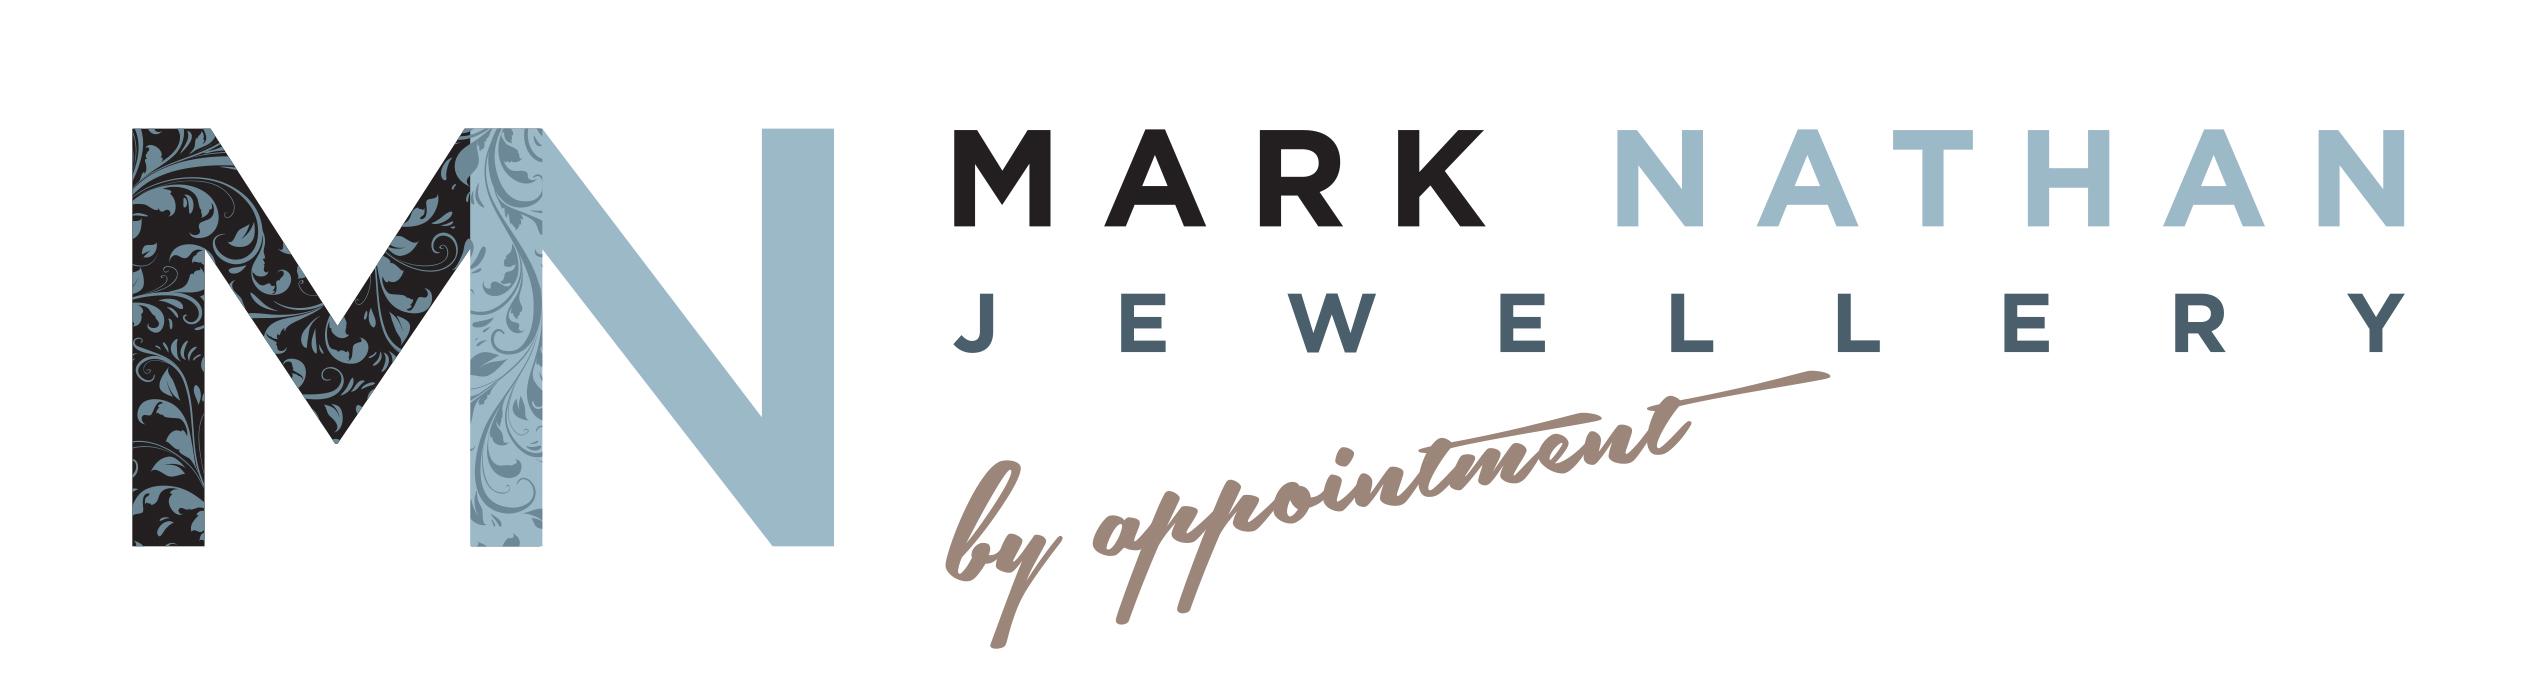 MN Jewellery